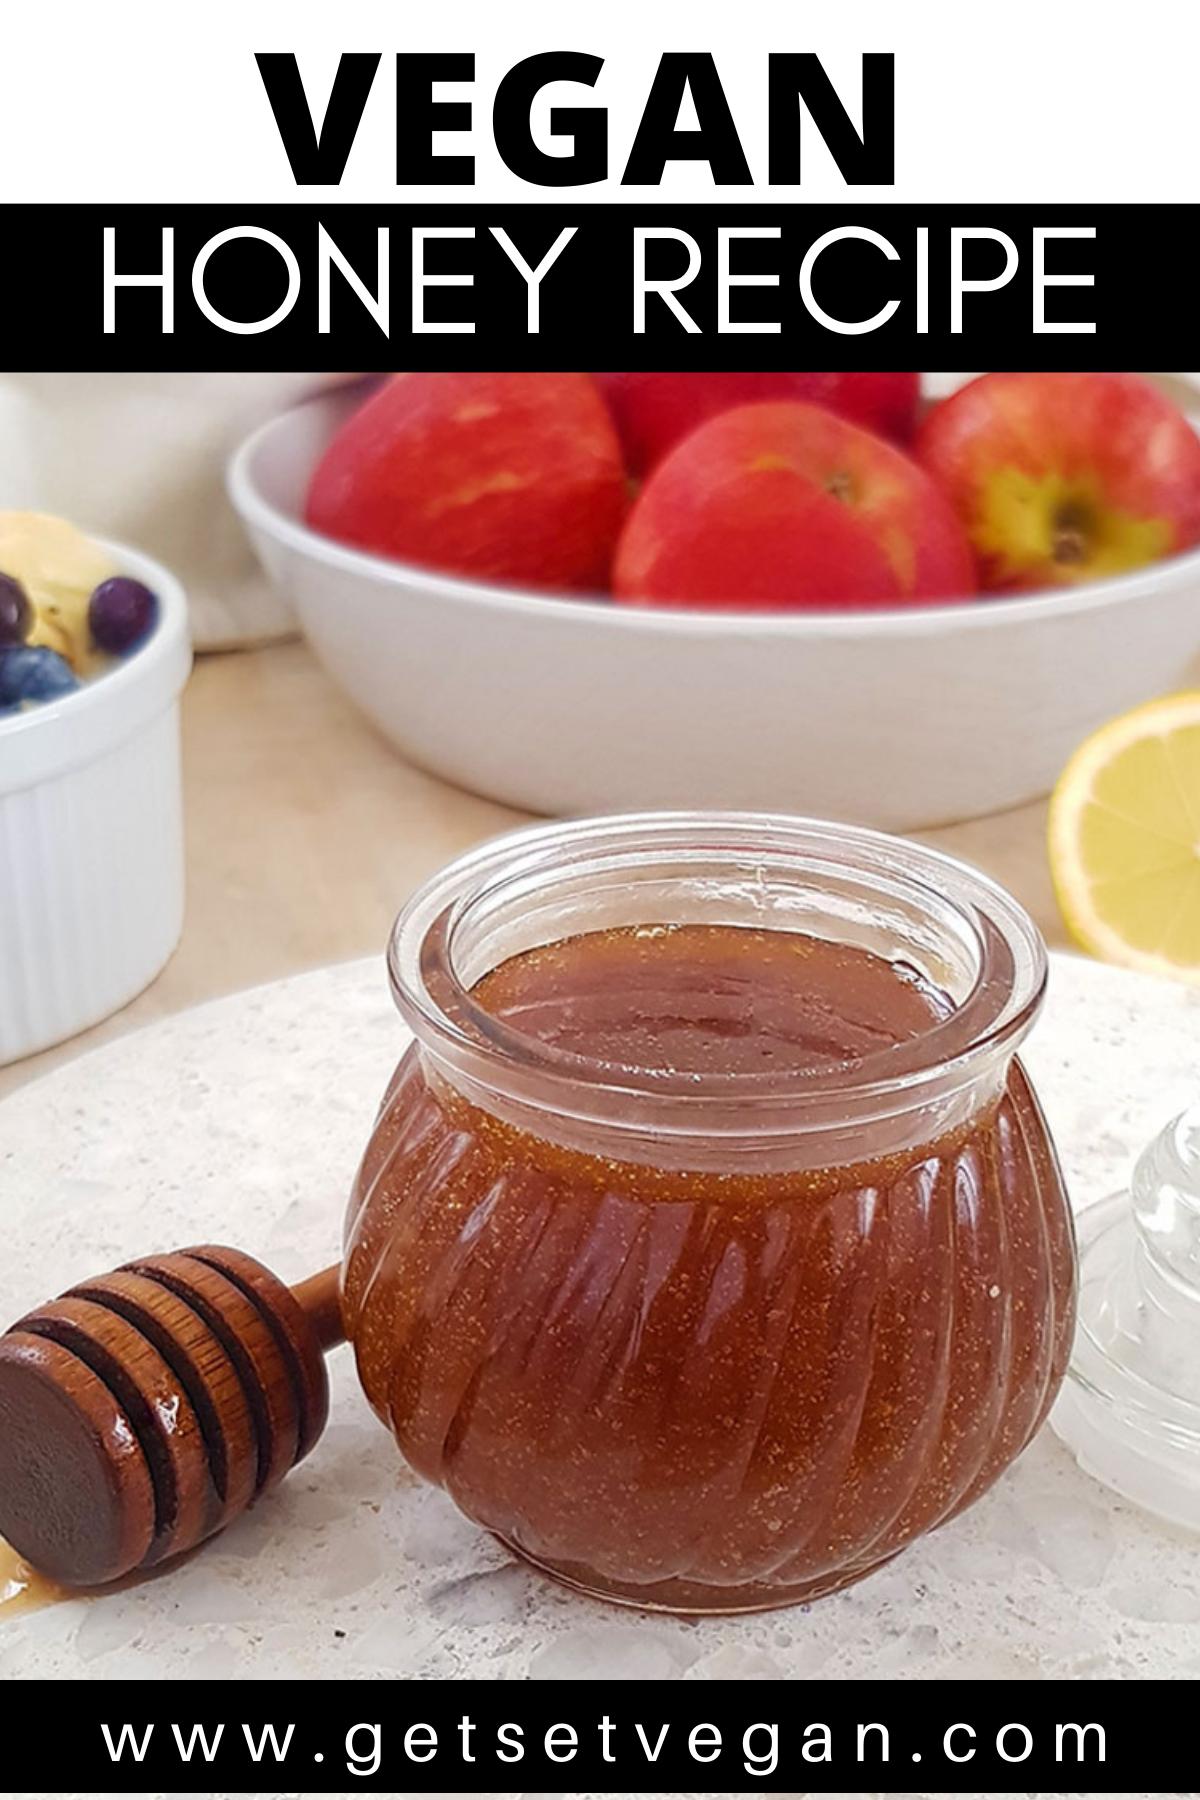 Vegan Honey Recipe Get Set Vegan Recipe In 2020 Honey Recipes Vegan Honey Recipe Recipes